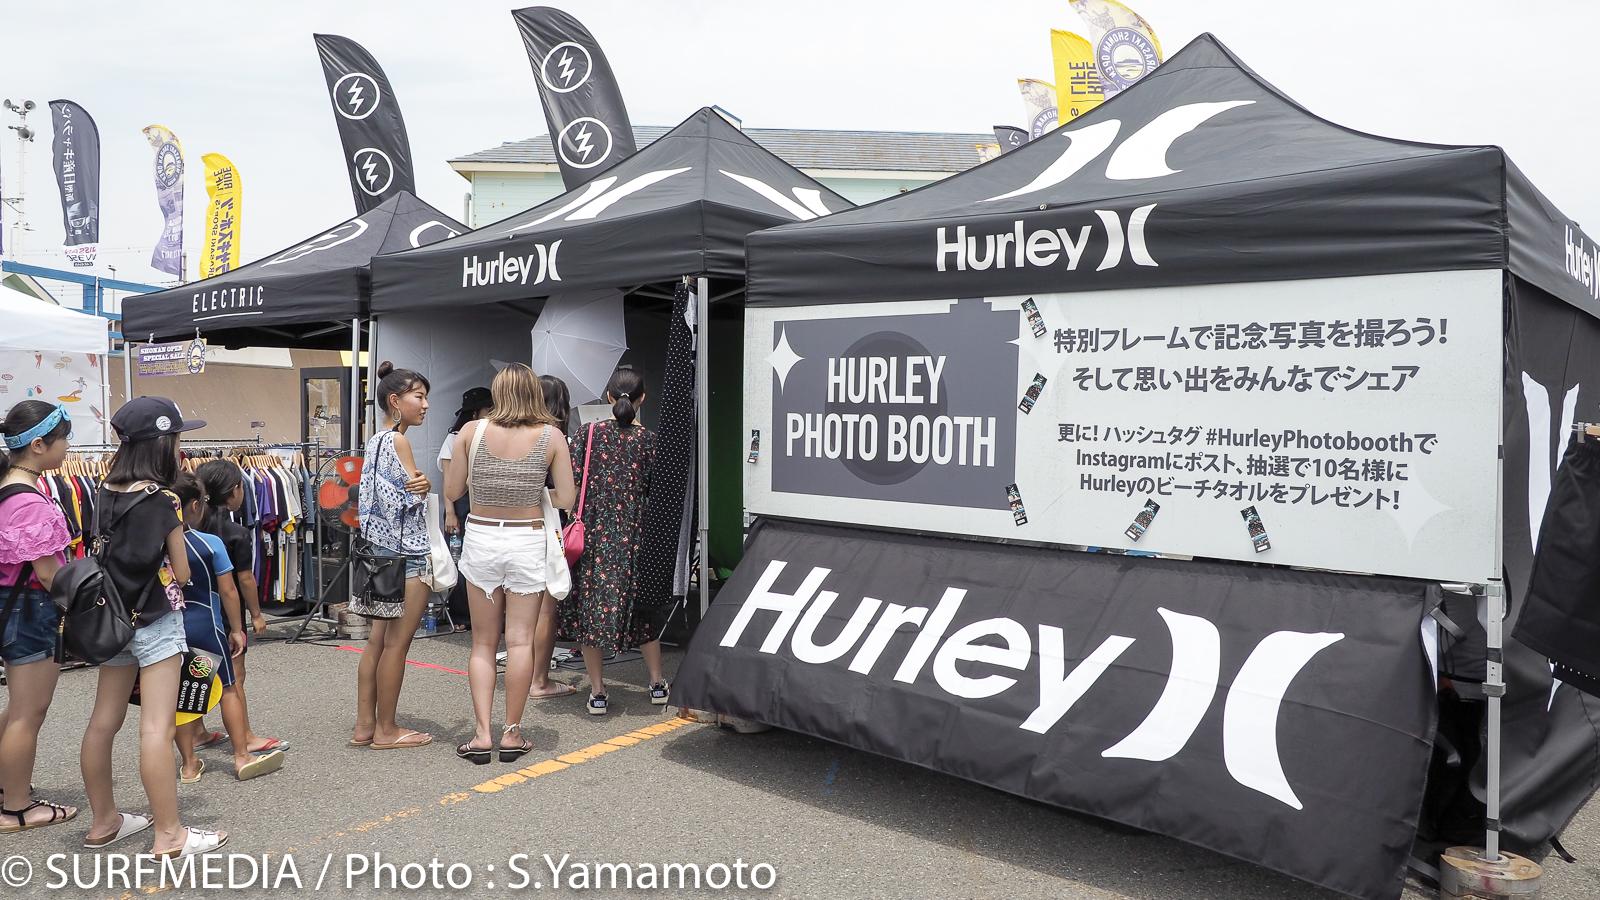 hurley-7170029